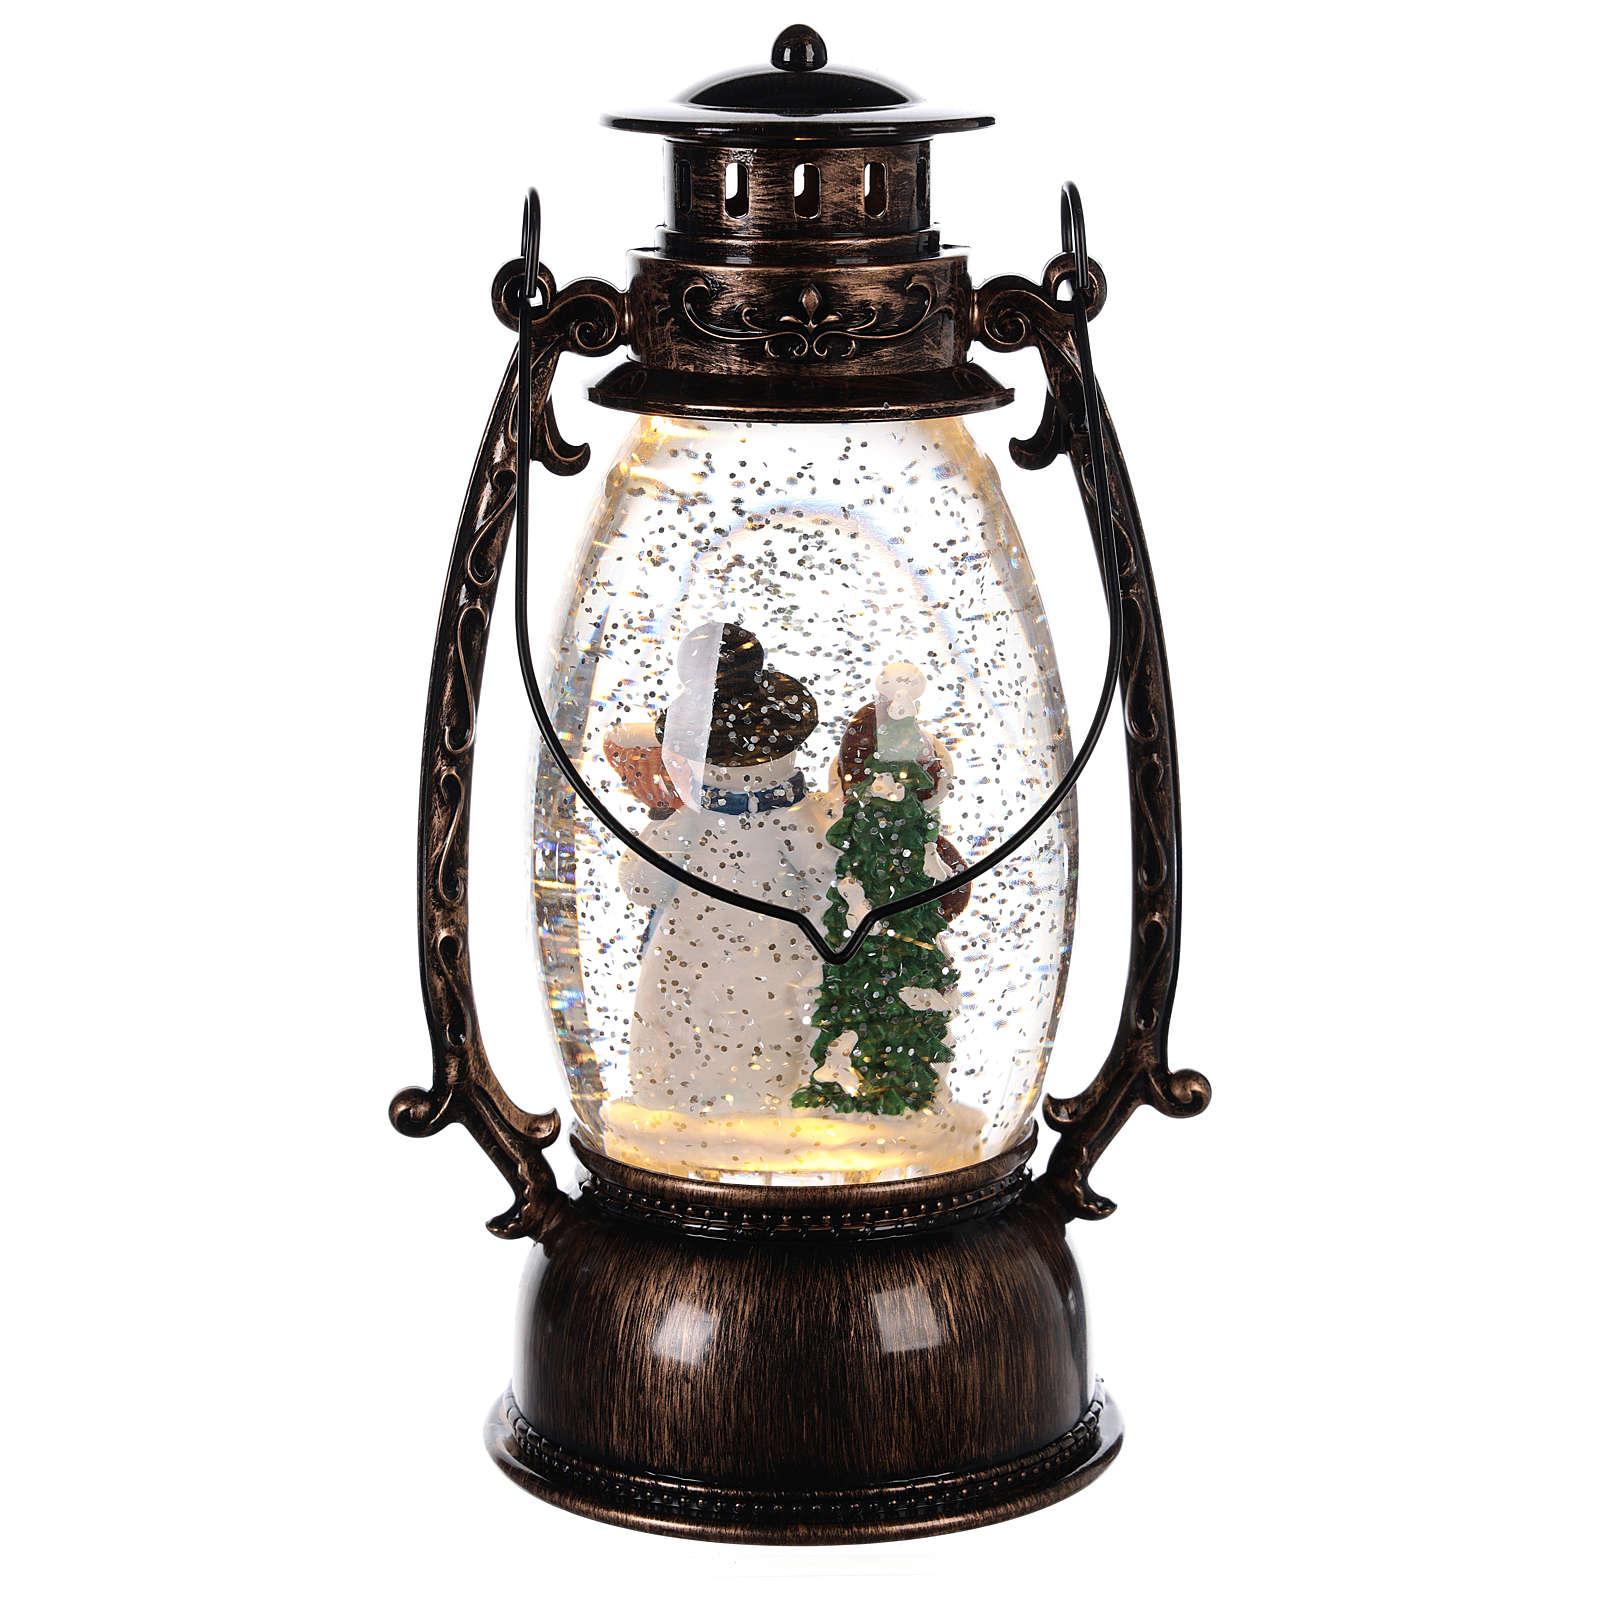 Globo de neve com bonecos de neve numa lanterna 25x10 cm 3